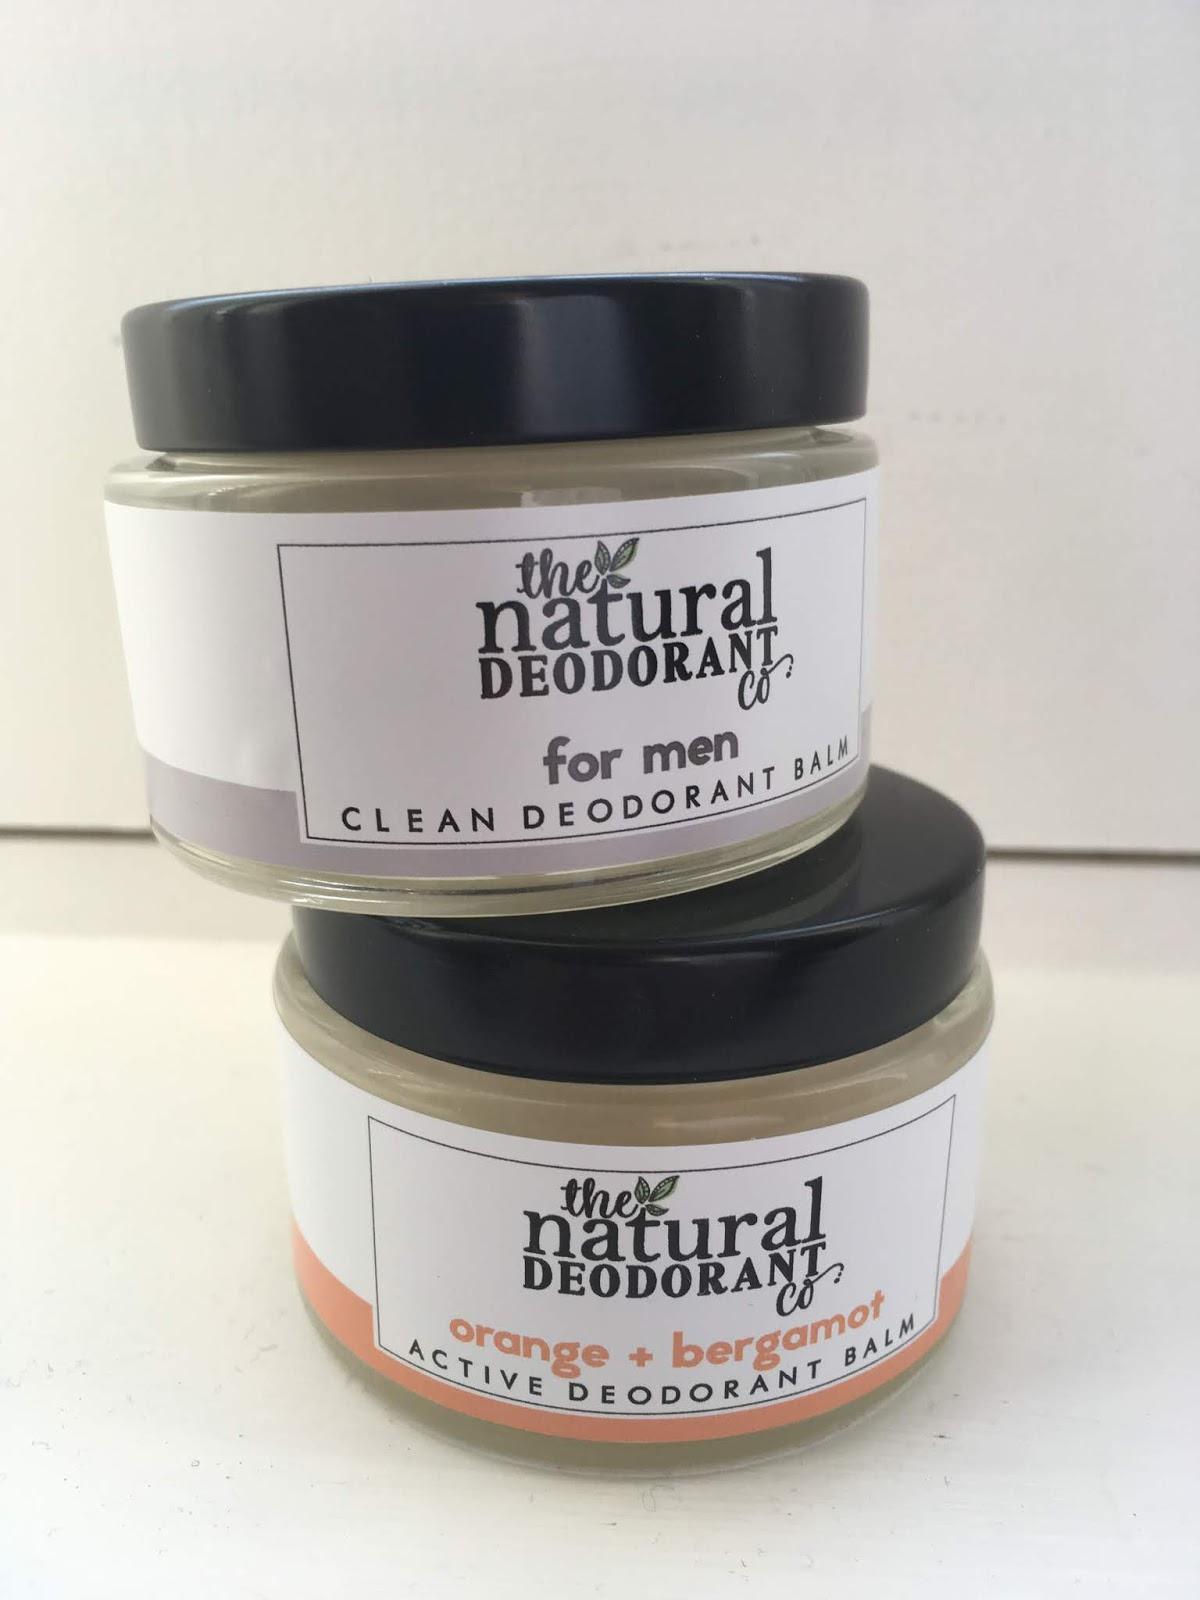 Natural Deodorant Company for Men and Active Deodorant